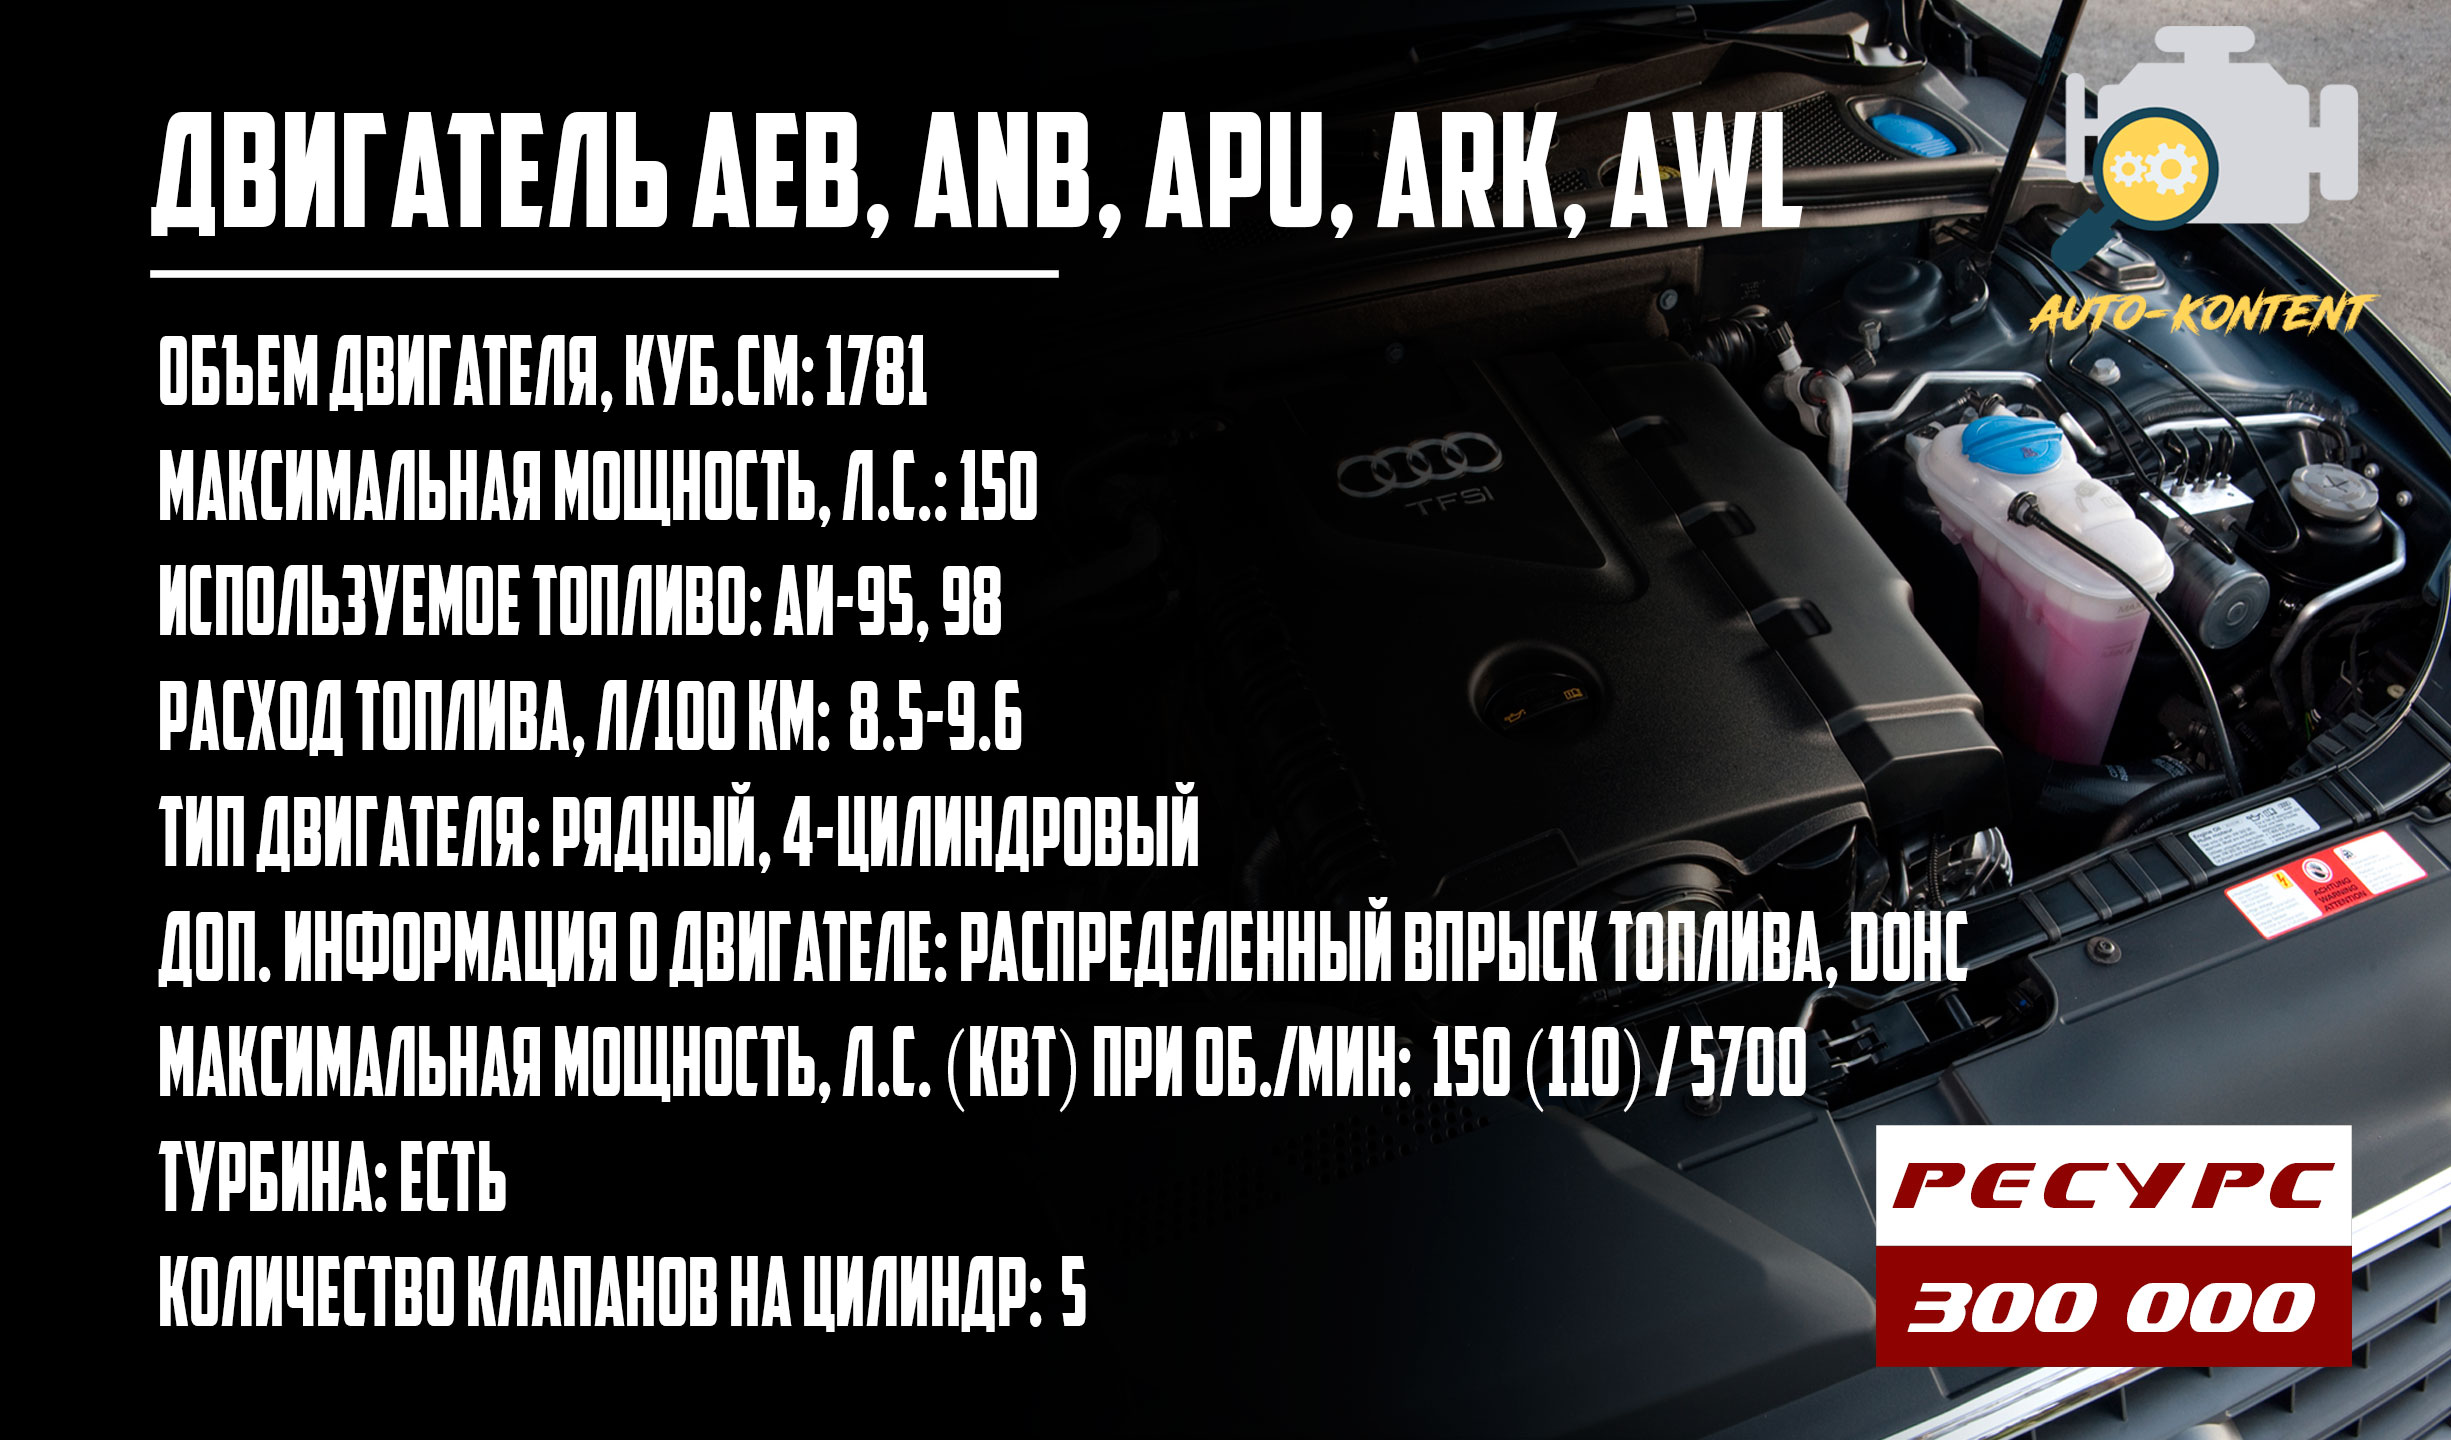 AEB, ANB, APU, ARK, AWL, AWT